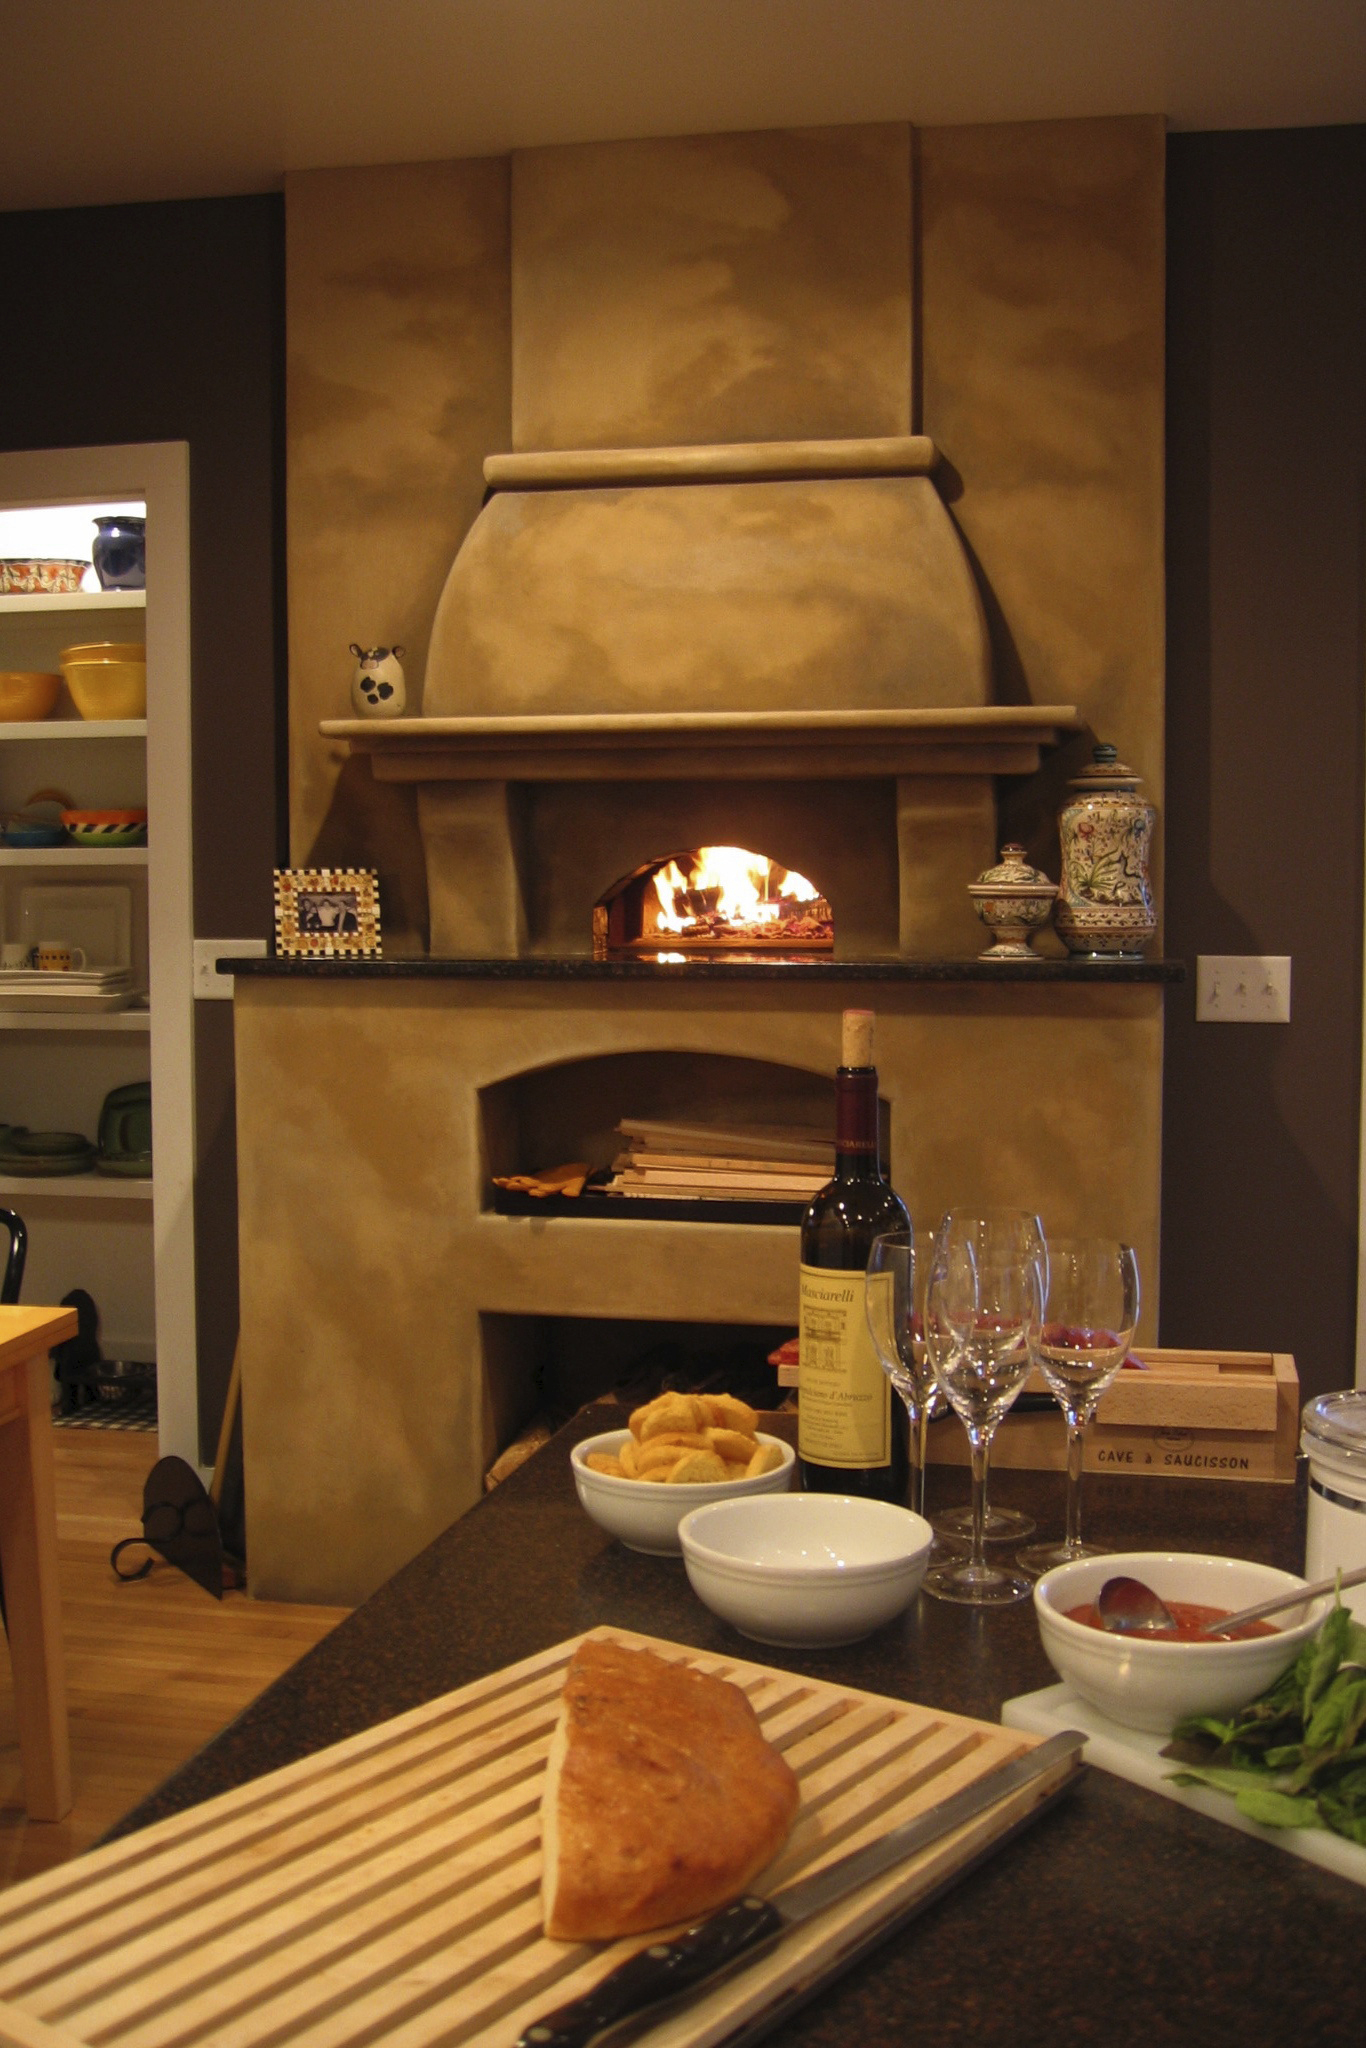 Mugnaini oven in a residential setting